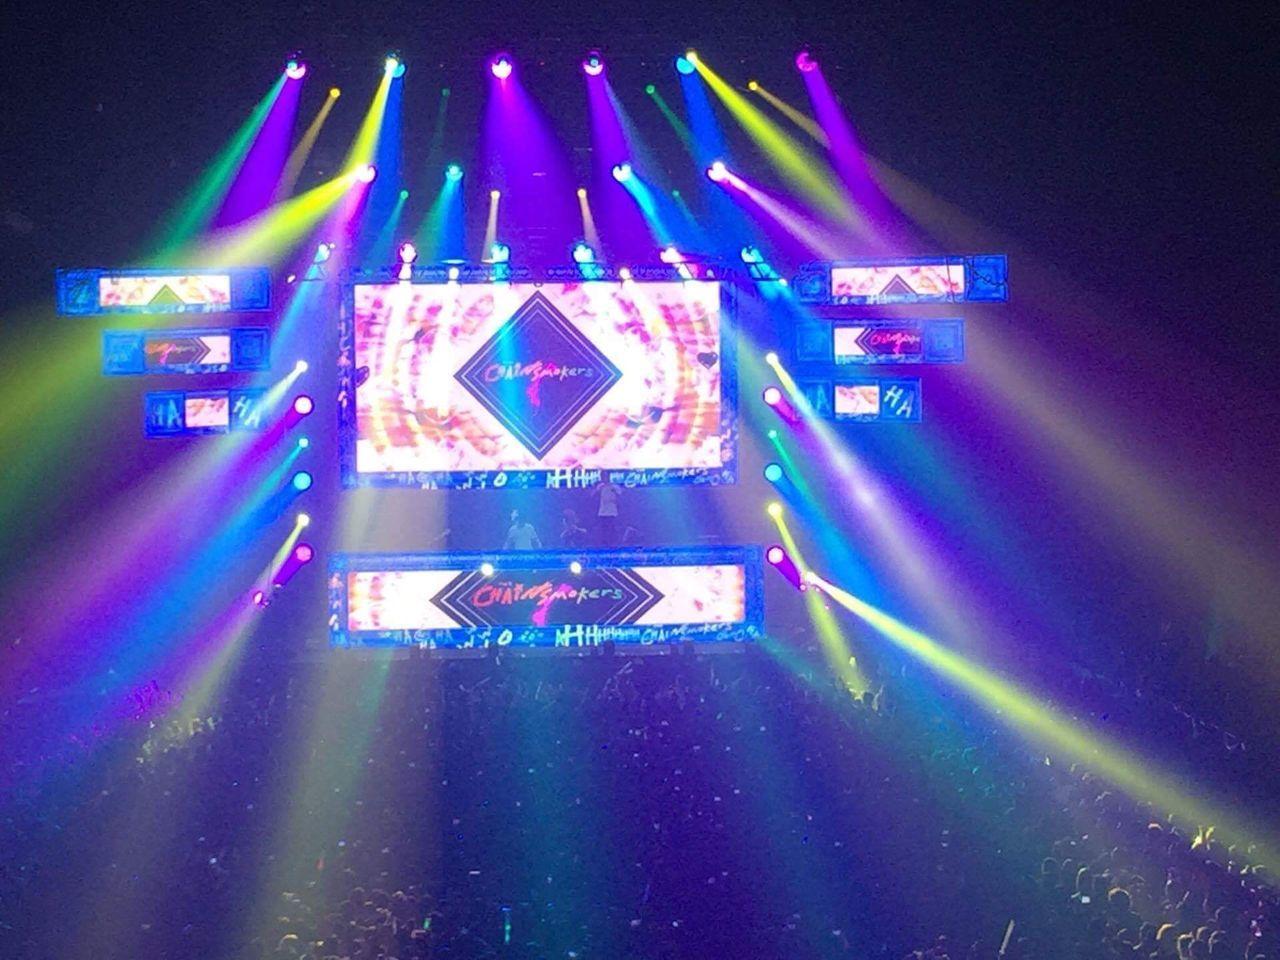 Illuminated Night Concert Chainsmokers Night Lights Nightlife Dance Music Crowd Manila, Philippines